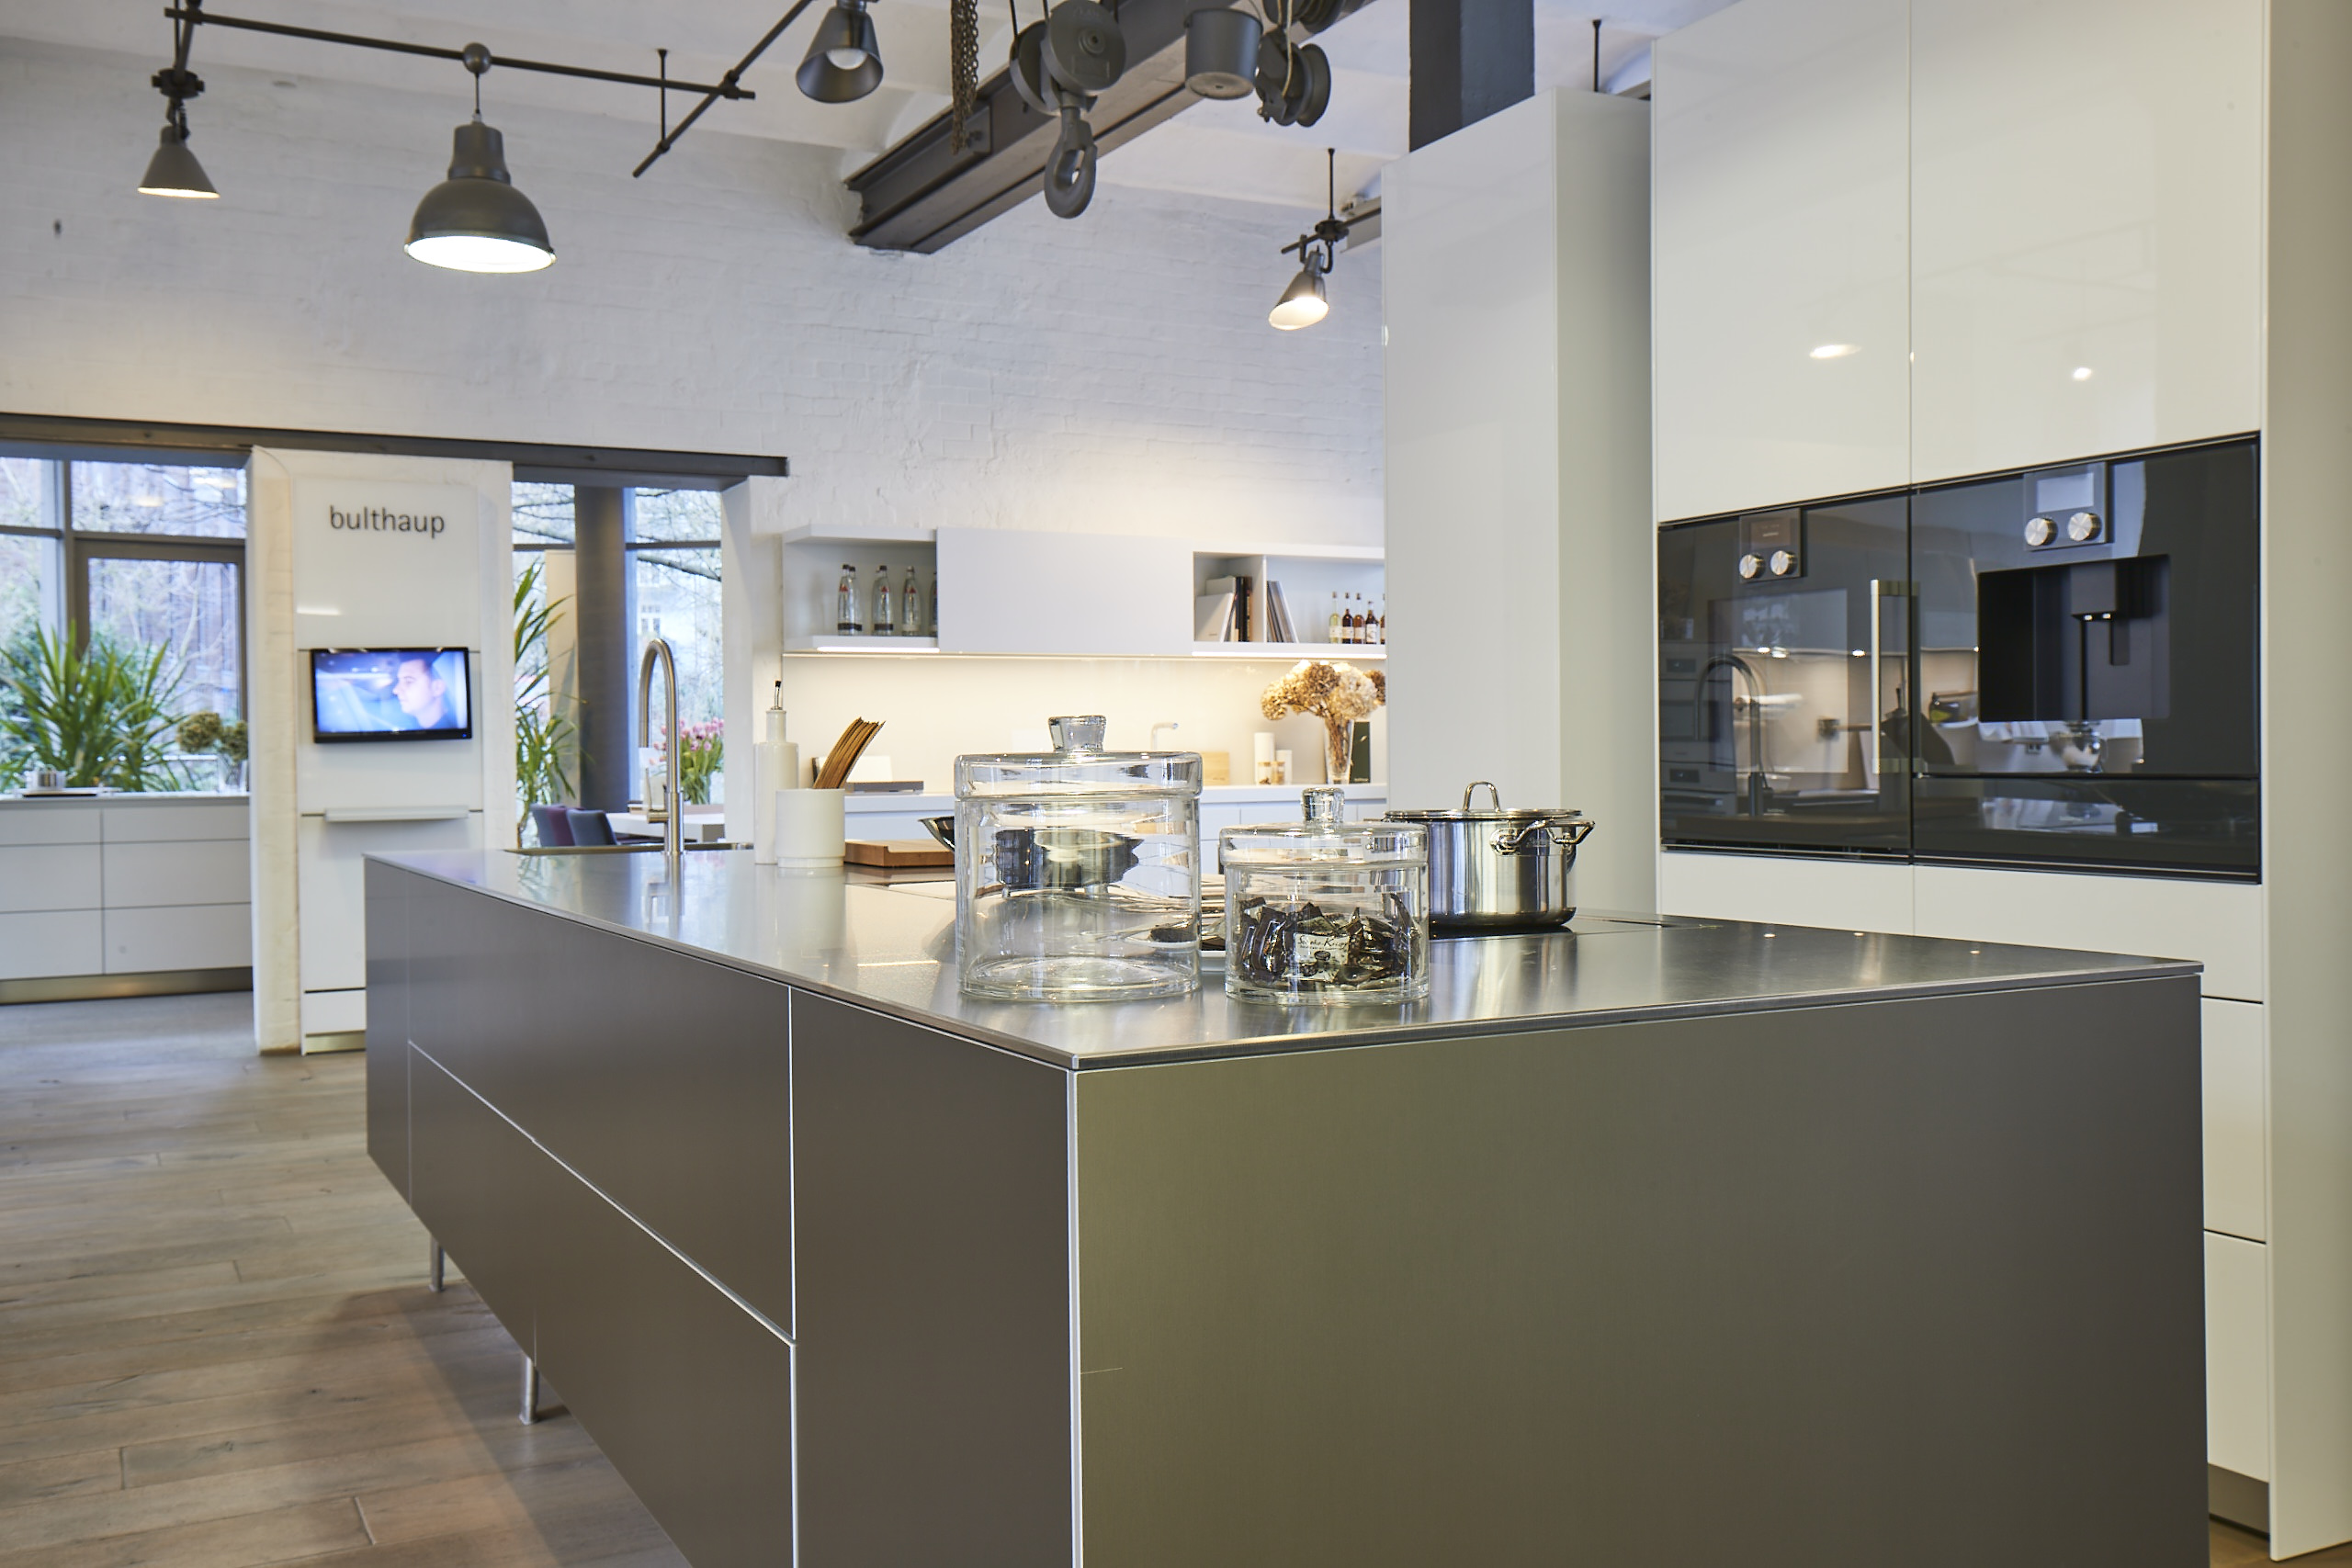 emejing bulthaup küchen preise photos house design ideas cuscinema us